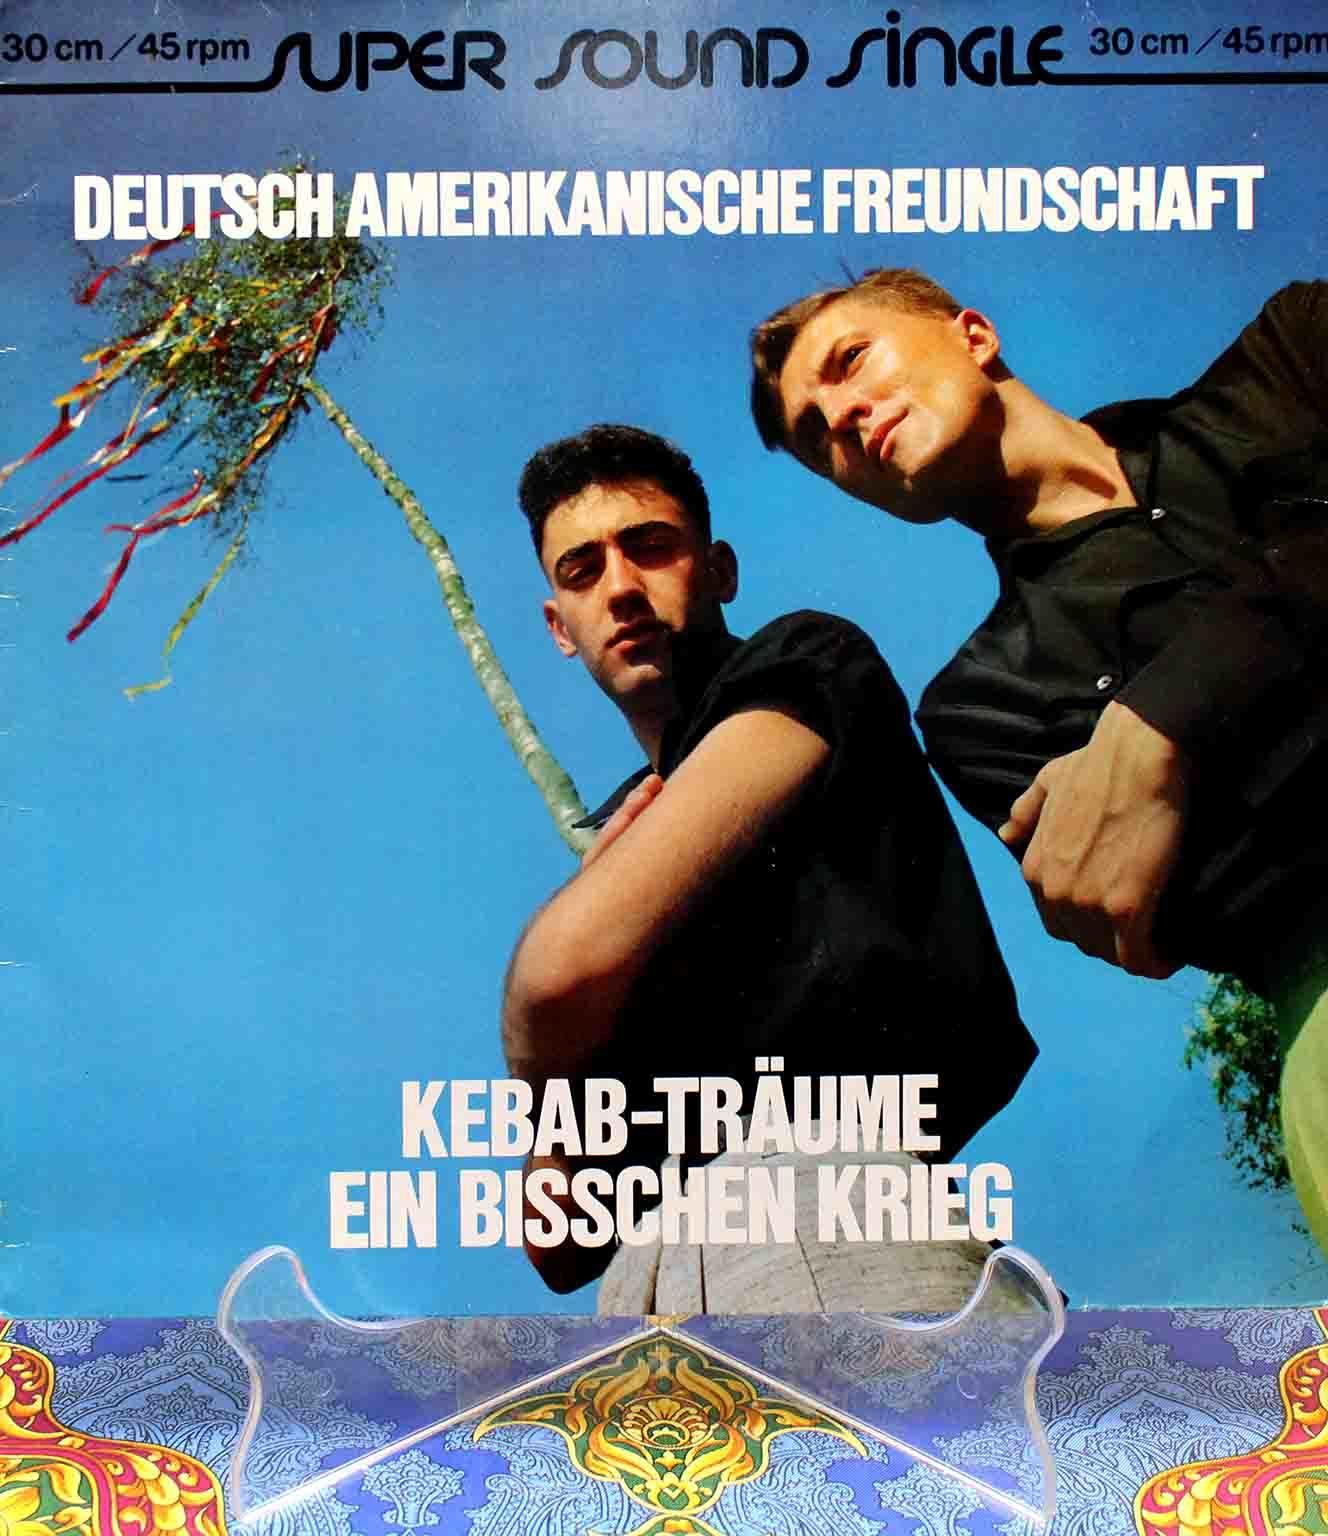 DAF – Kebab-Träume (Ger 12`Special Long Version) 01